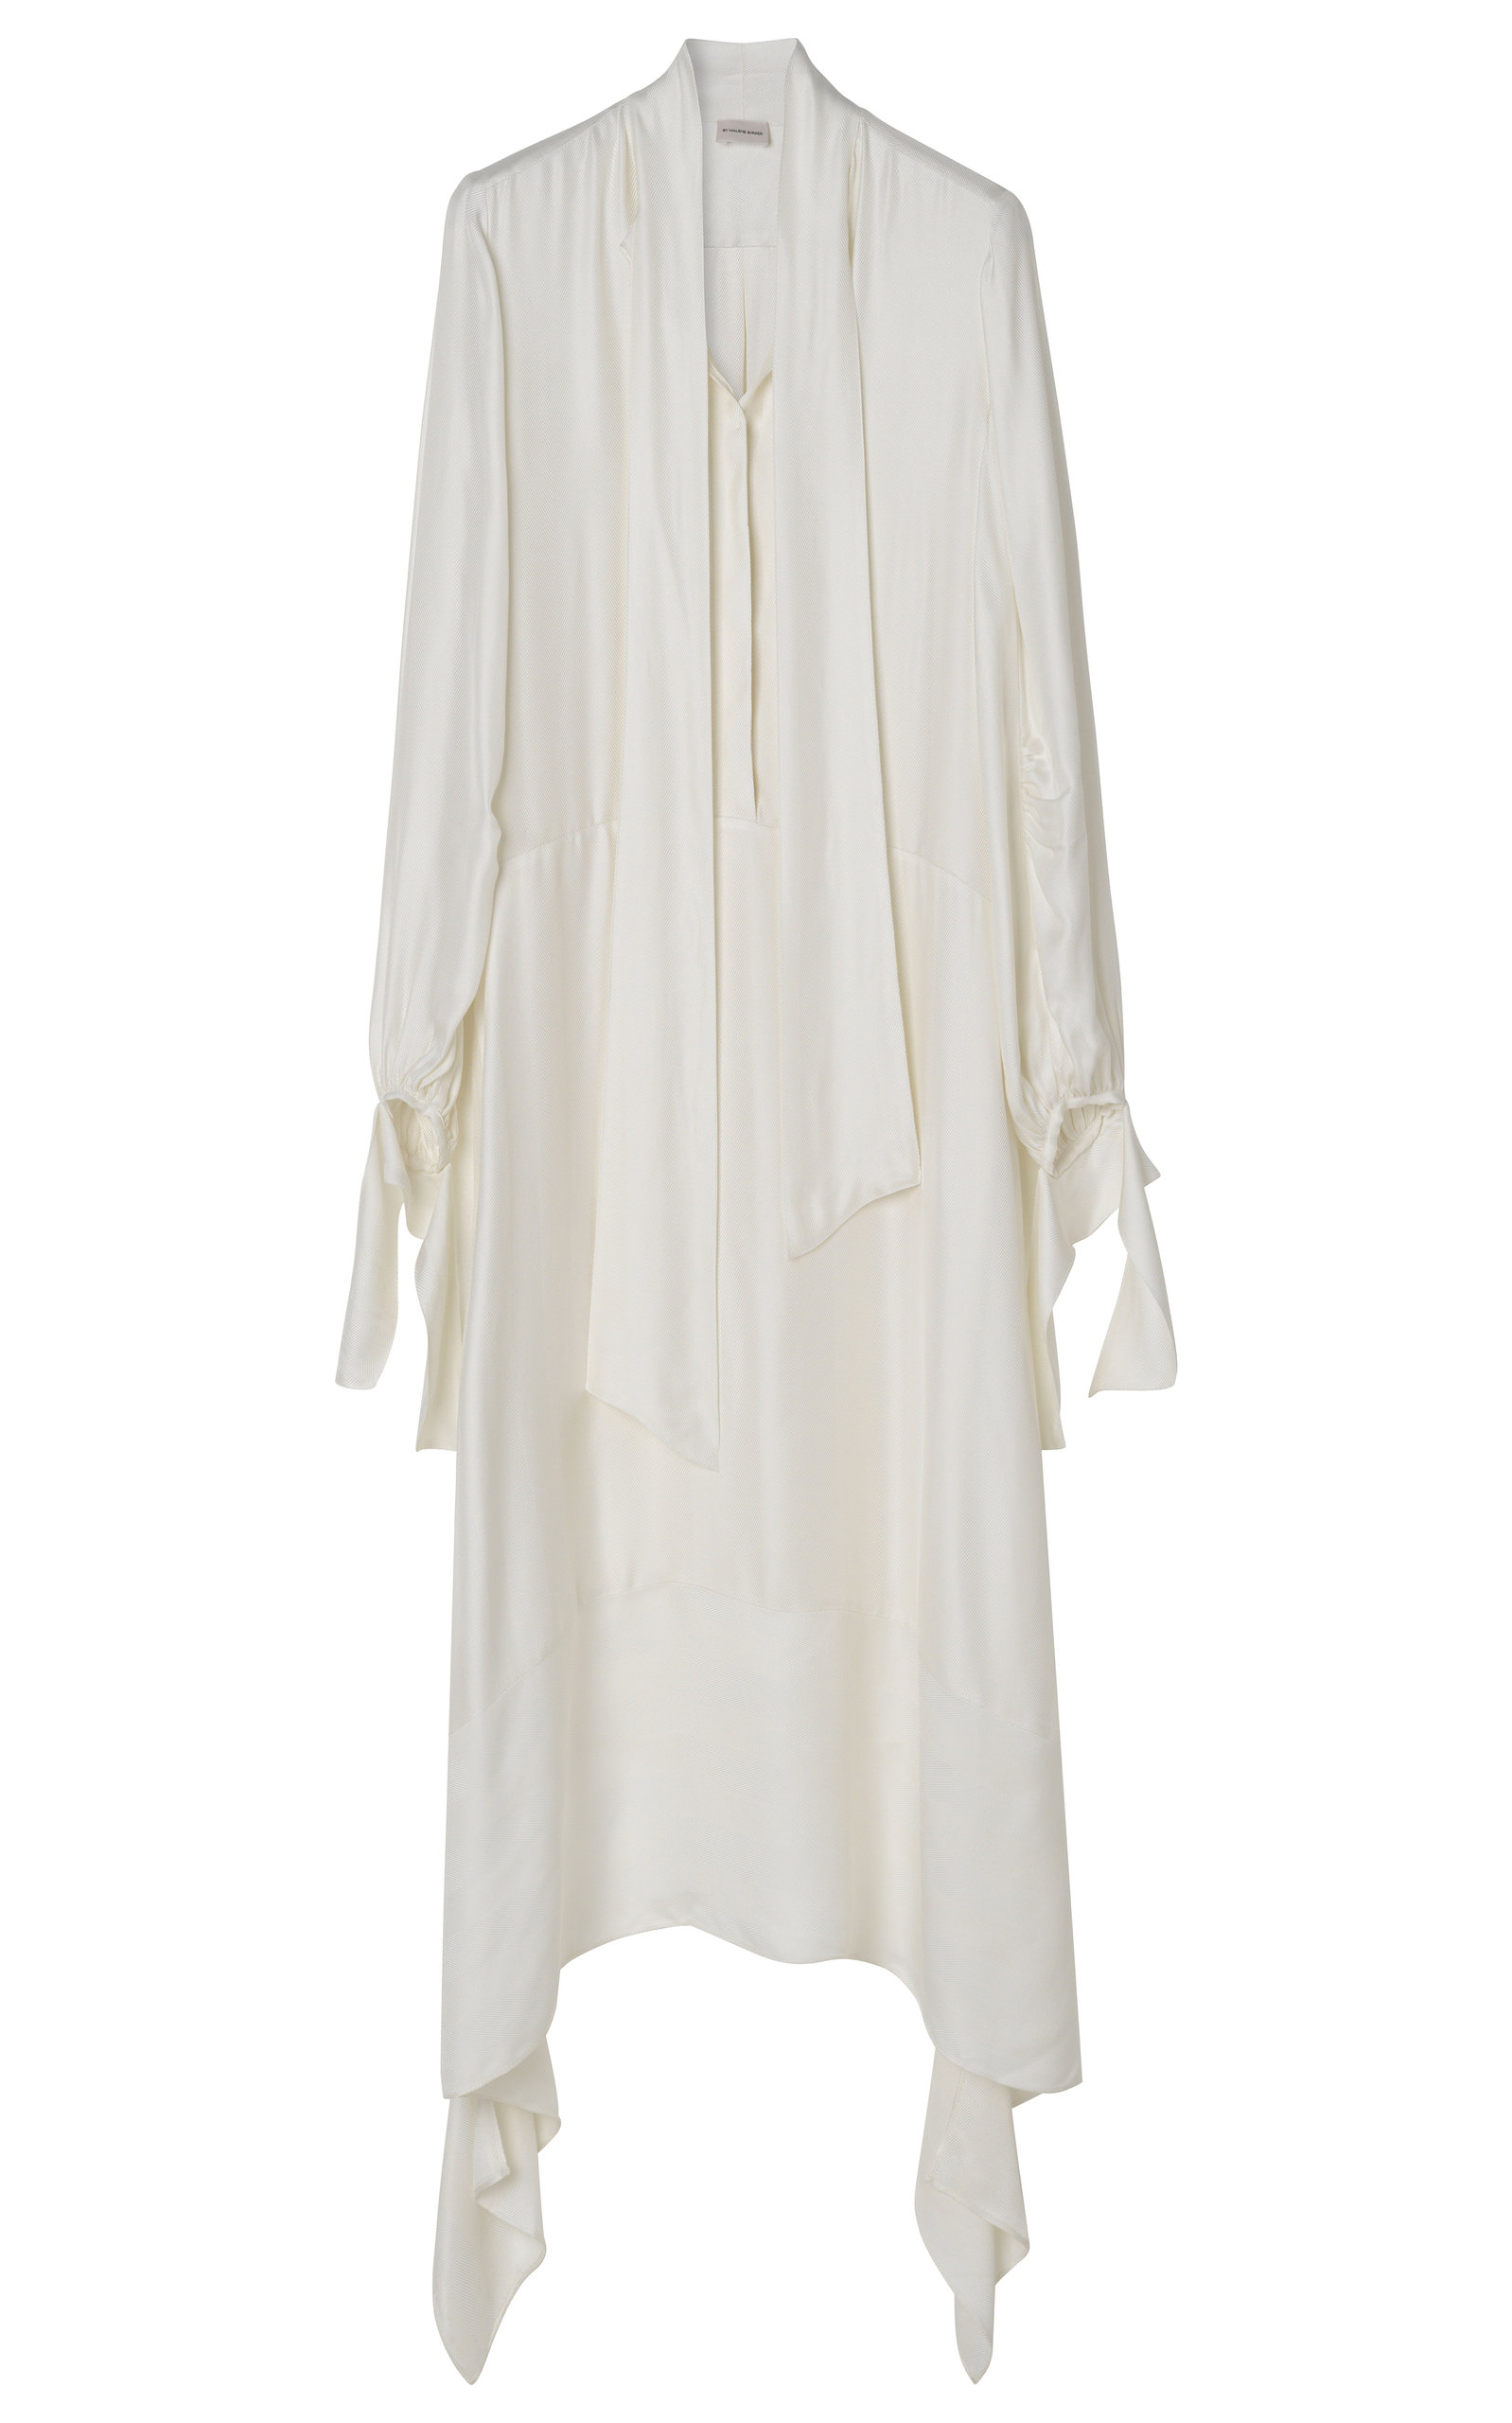 Buy By Malene Birger Niccolo Viscose Herringbone Twill Dress online, shop By Malene Birger at the best price